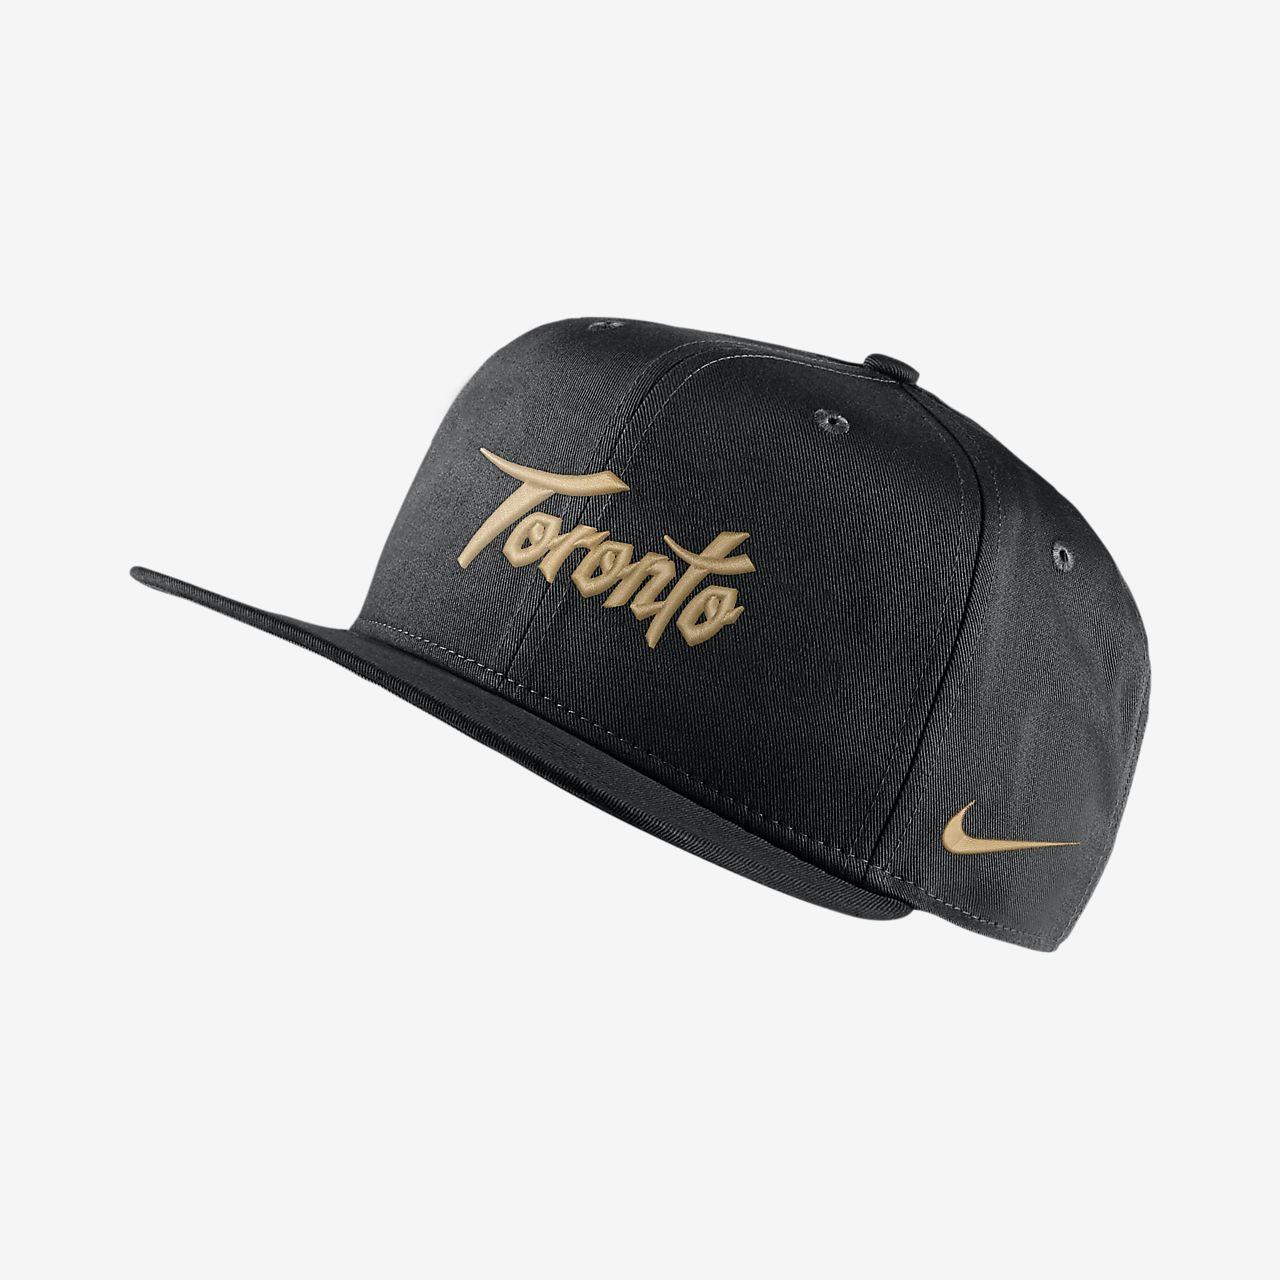 Toronto Raptors City Edition Nike Pro NBA Adjustable Hat